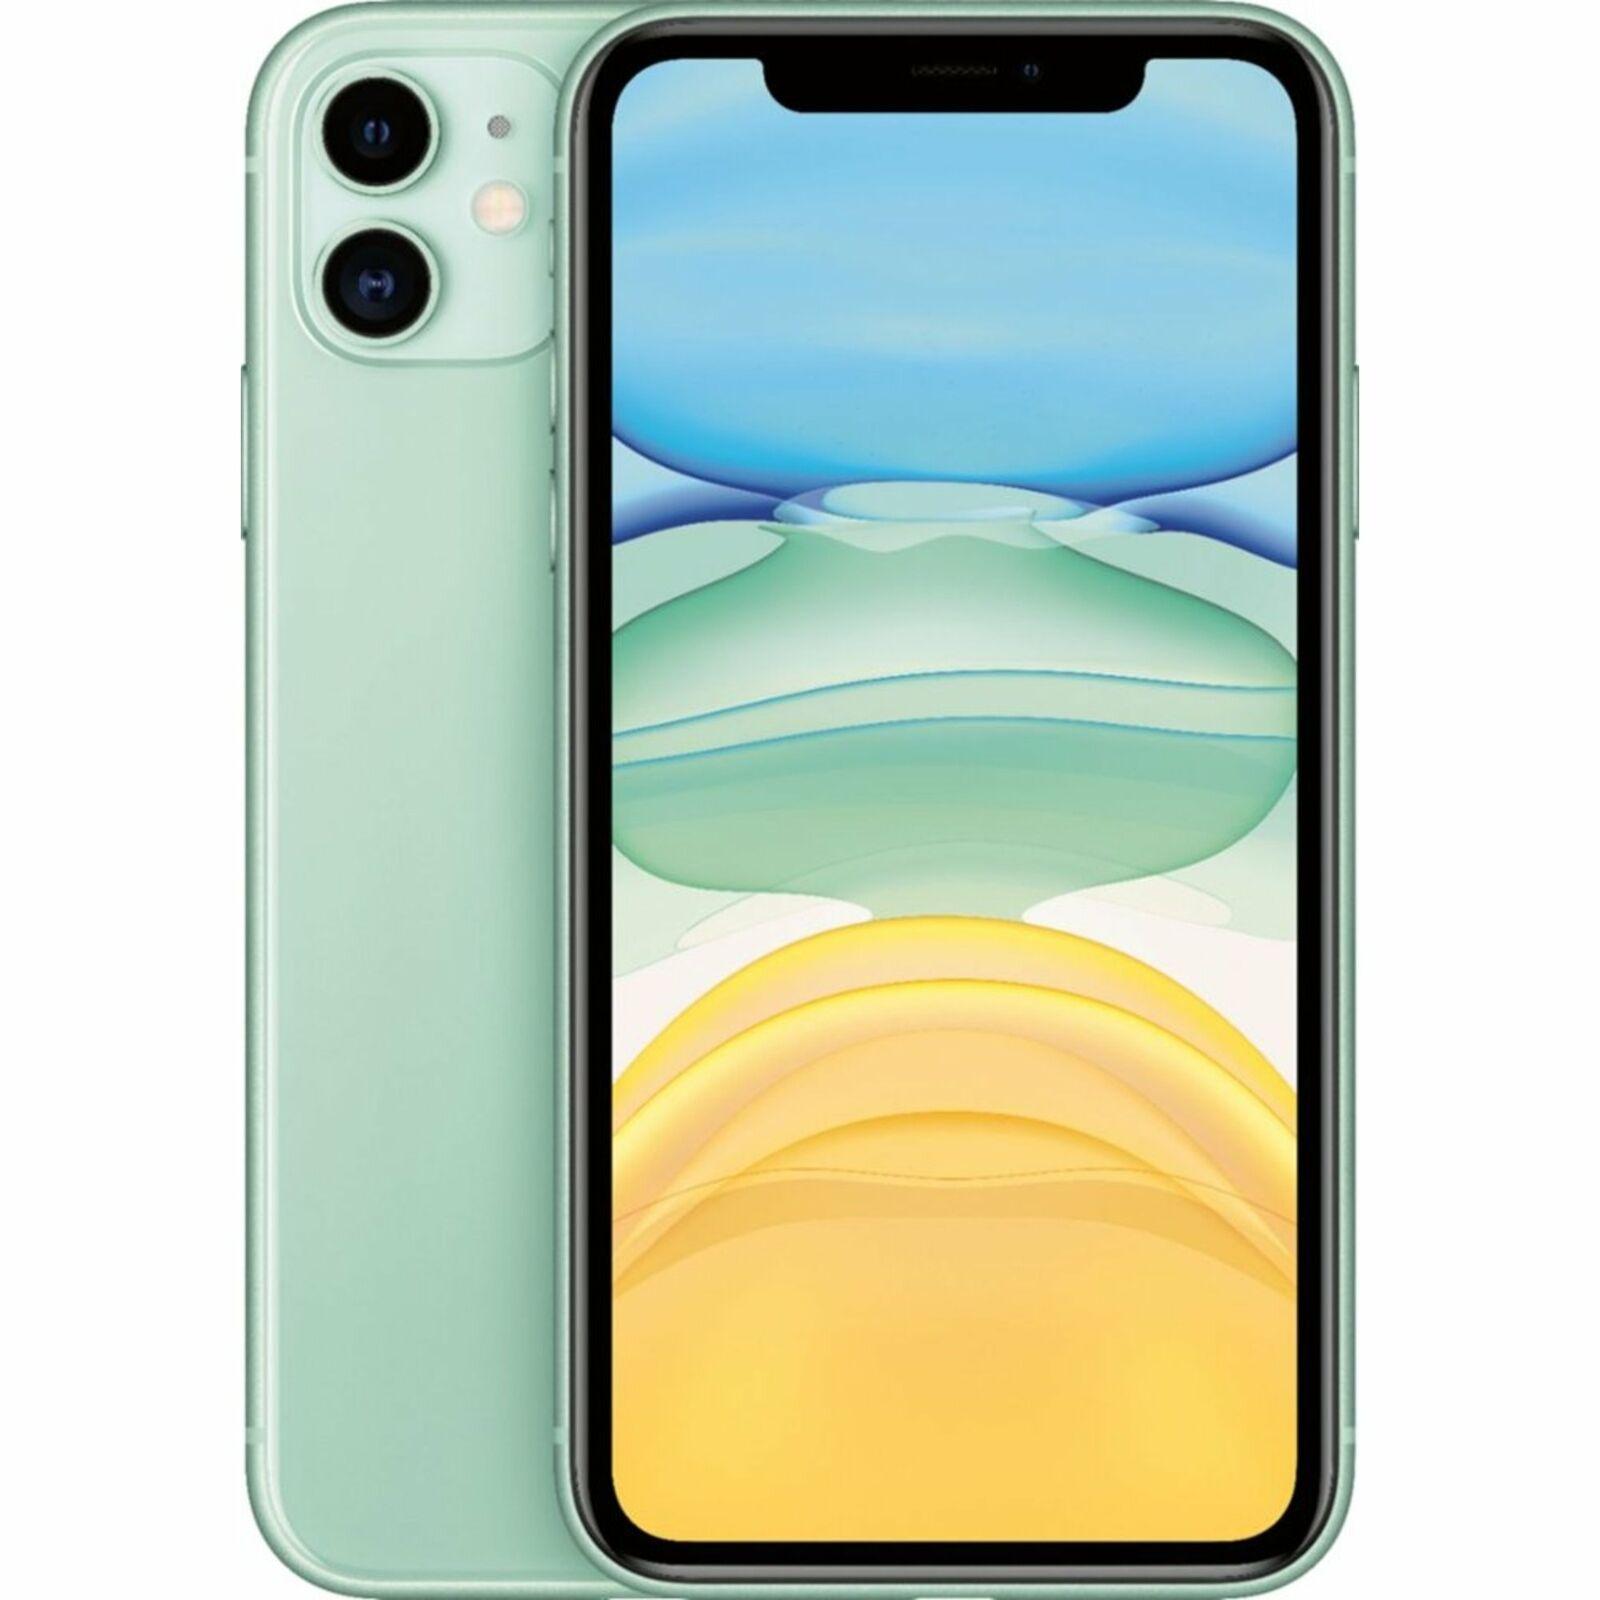 Apple iPhone 11 256GB Fully Unlocked (Verizon + Sprint + GSM Unlocked) - Green